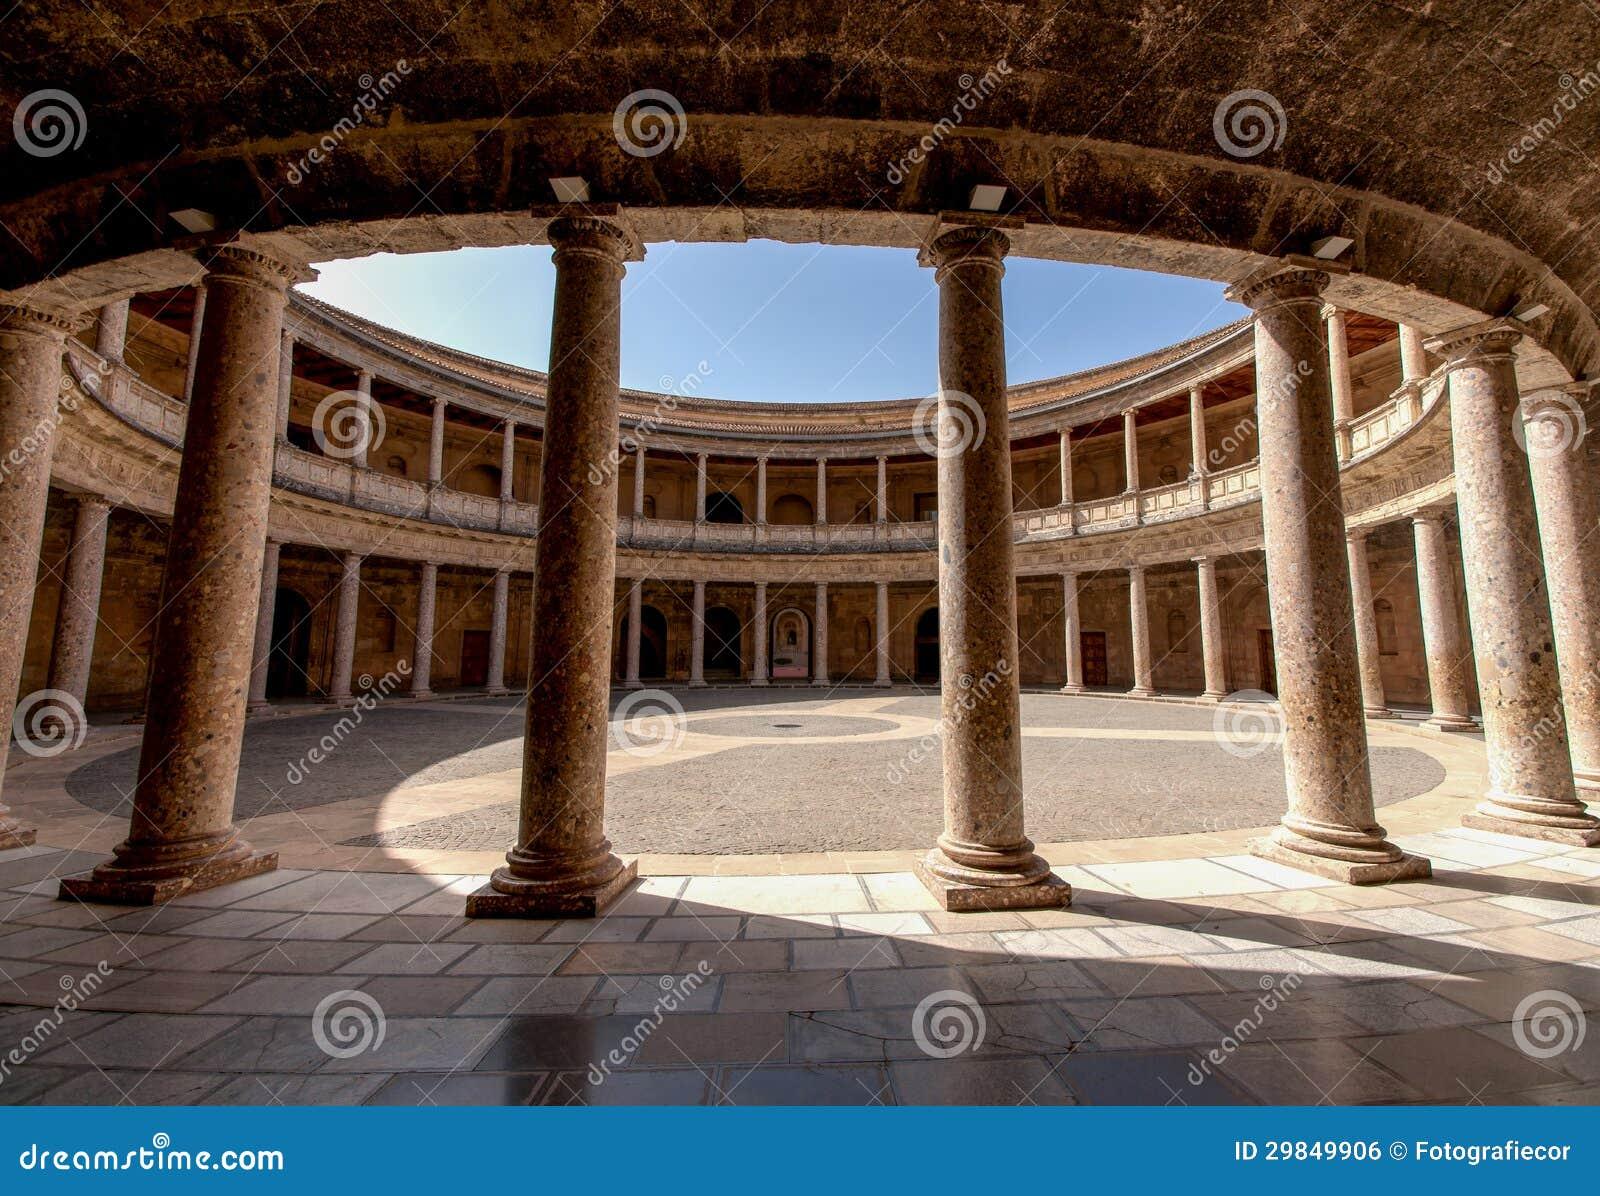 Alhambra De Granada. Court Of The Carlos V Palace Royalty Free Stock Image - ...